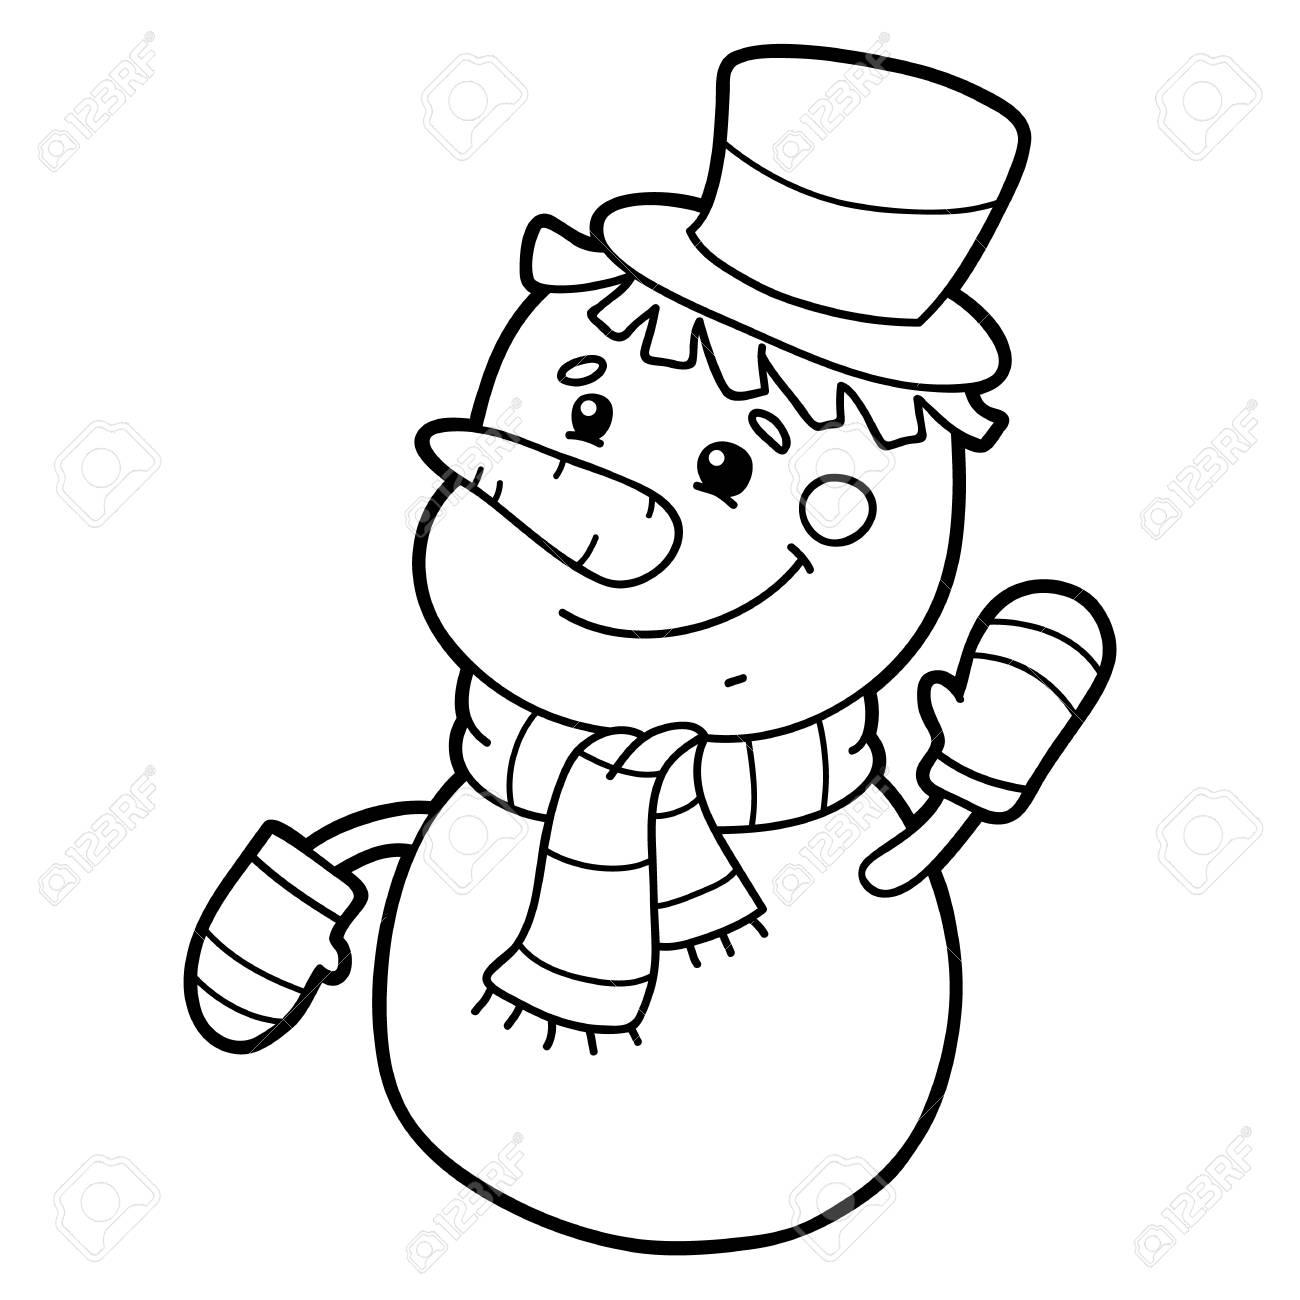 Personaje De Dibujos Animados Lindo Muñeco De Nieve Para Niños ...